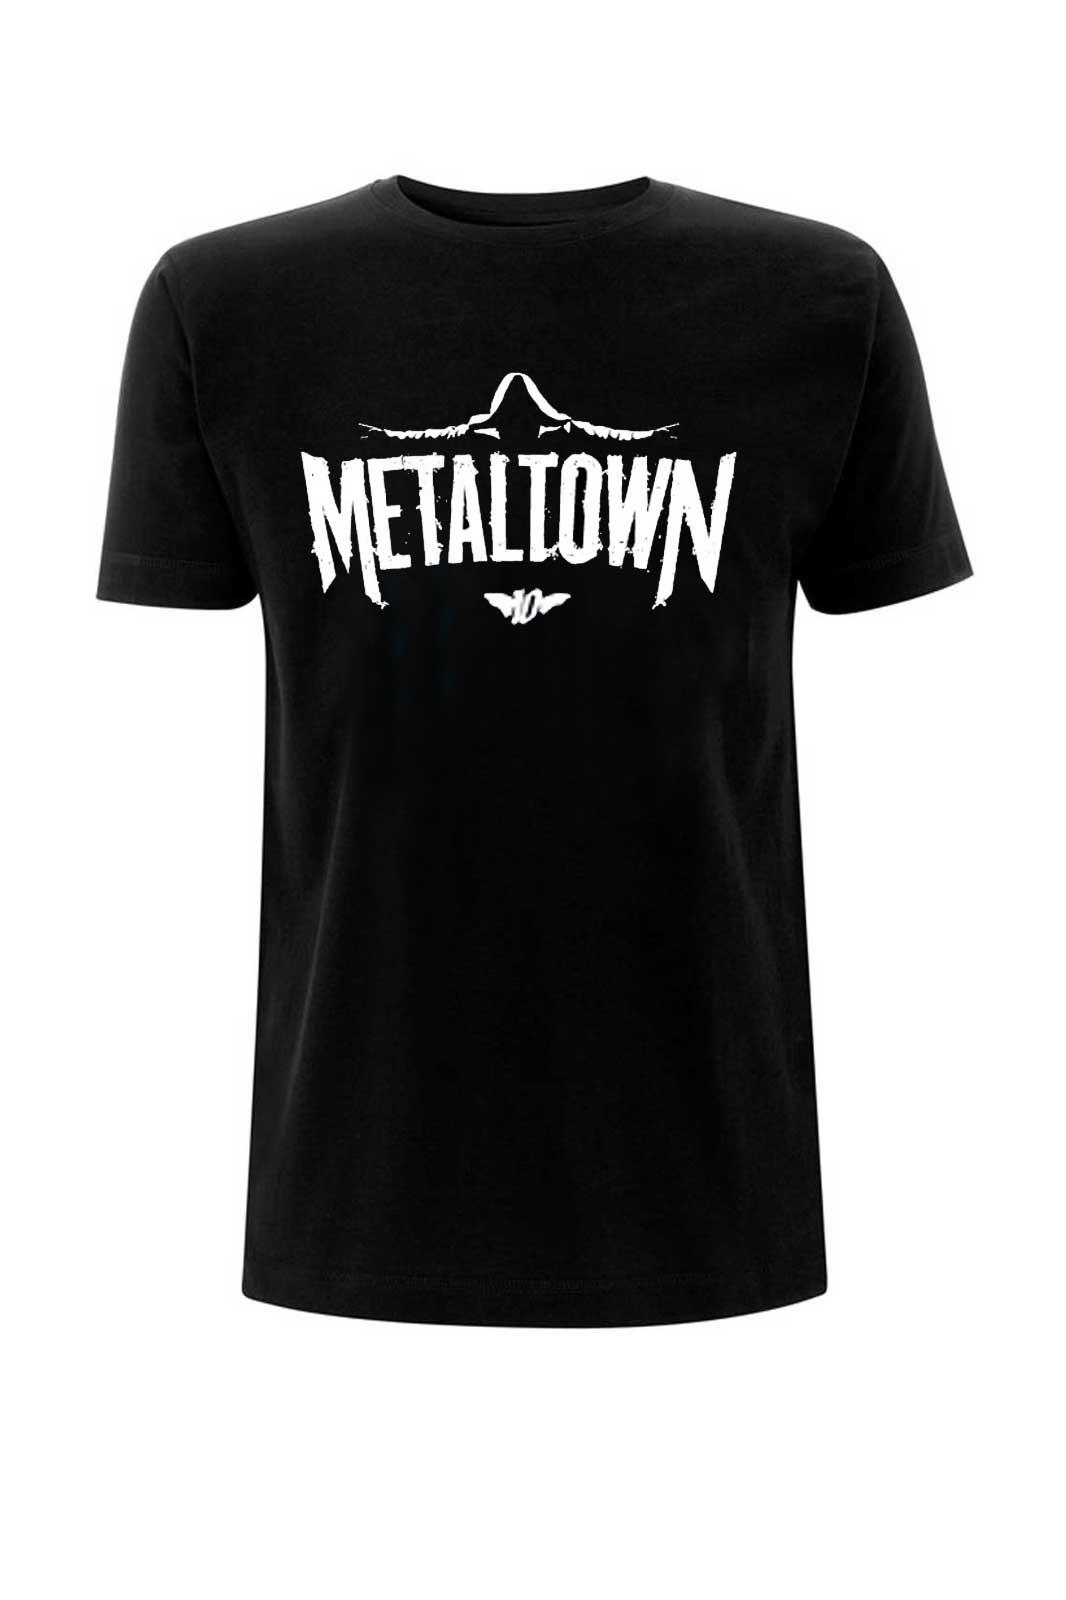 Tee Metaltown 2013